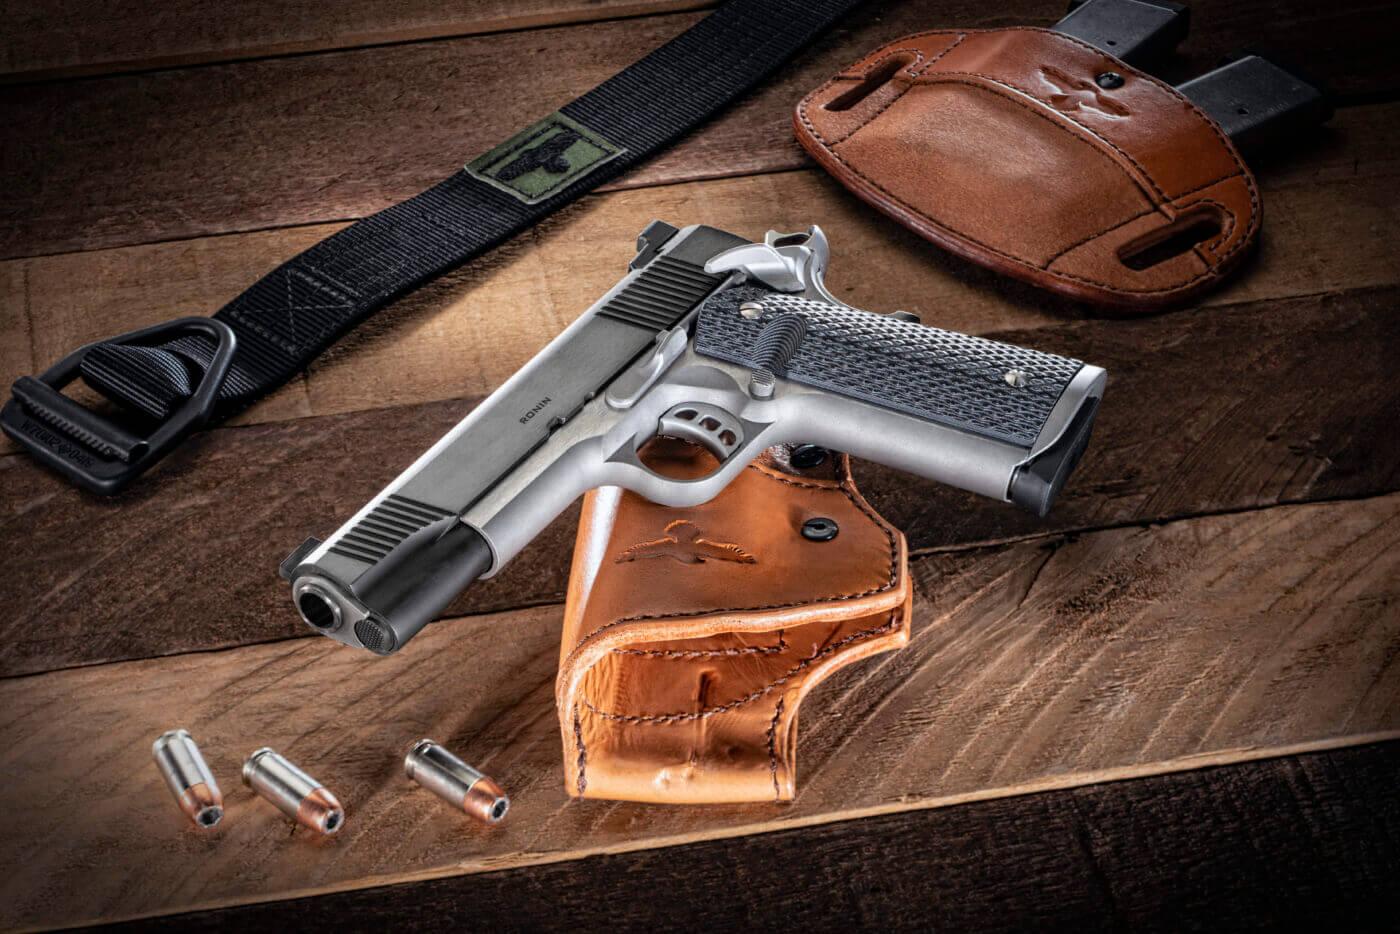 Ronin 1911 pistol with custom upgrades